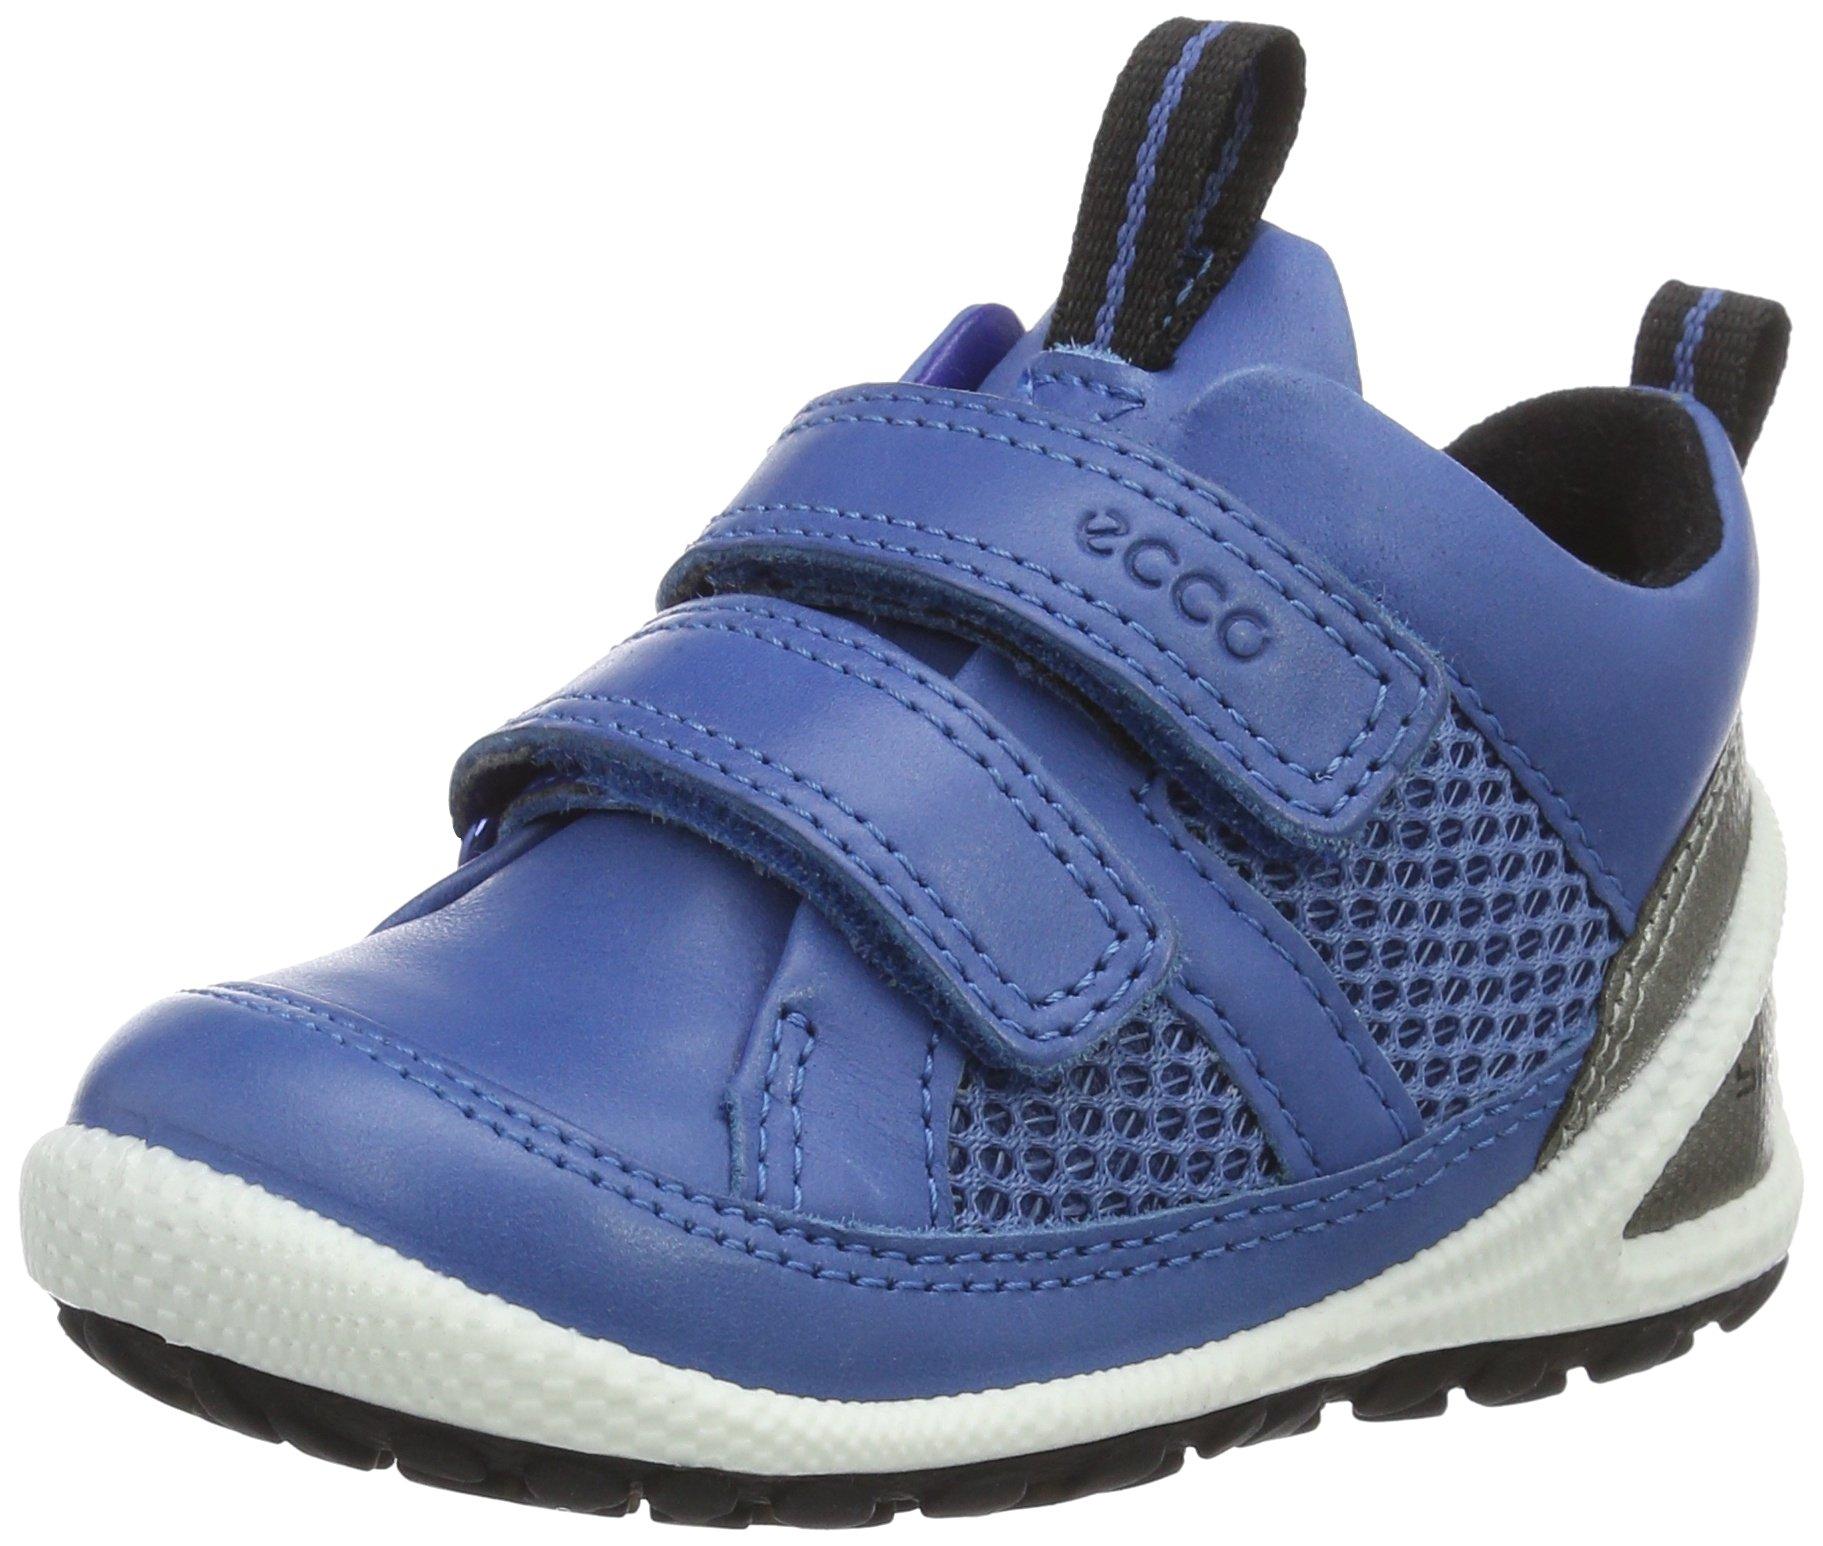 Ecco Walking Shoes On Ebay Size